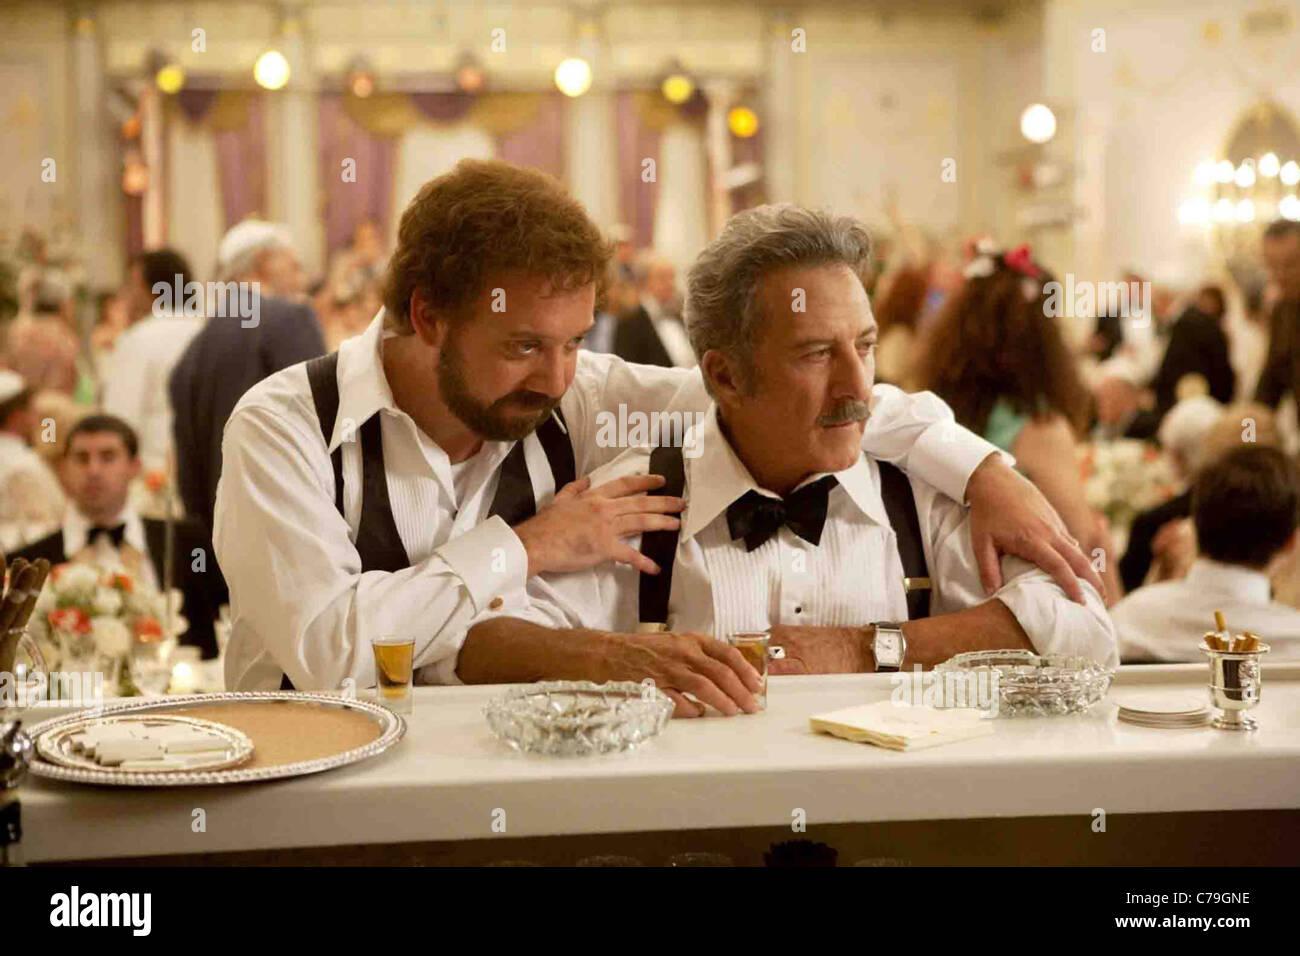 BARNEY'S VERSION (2010) PAUL GIAMATTI, DUSTIN HOFFMAN RICHARD J LEWIS (DIR) 005 MOVIESTORE COLLECTION LTD - Stock Image